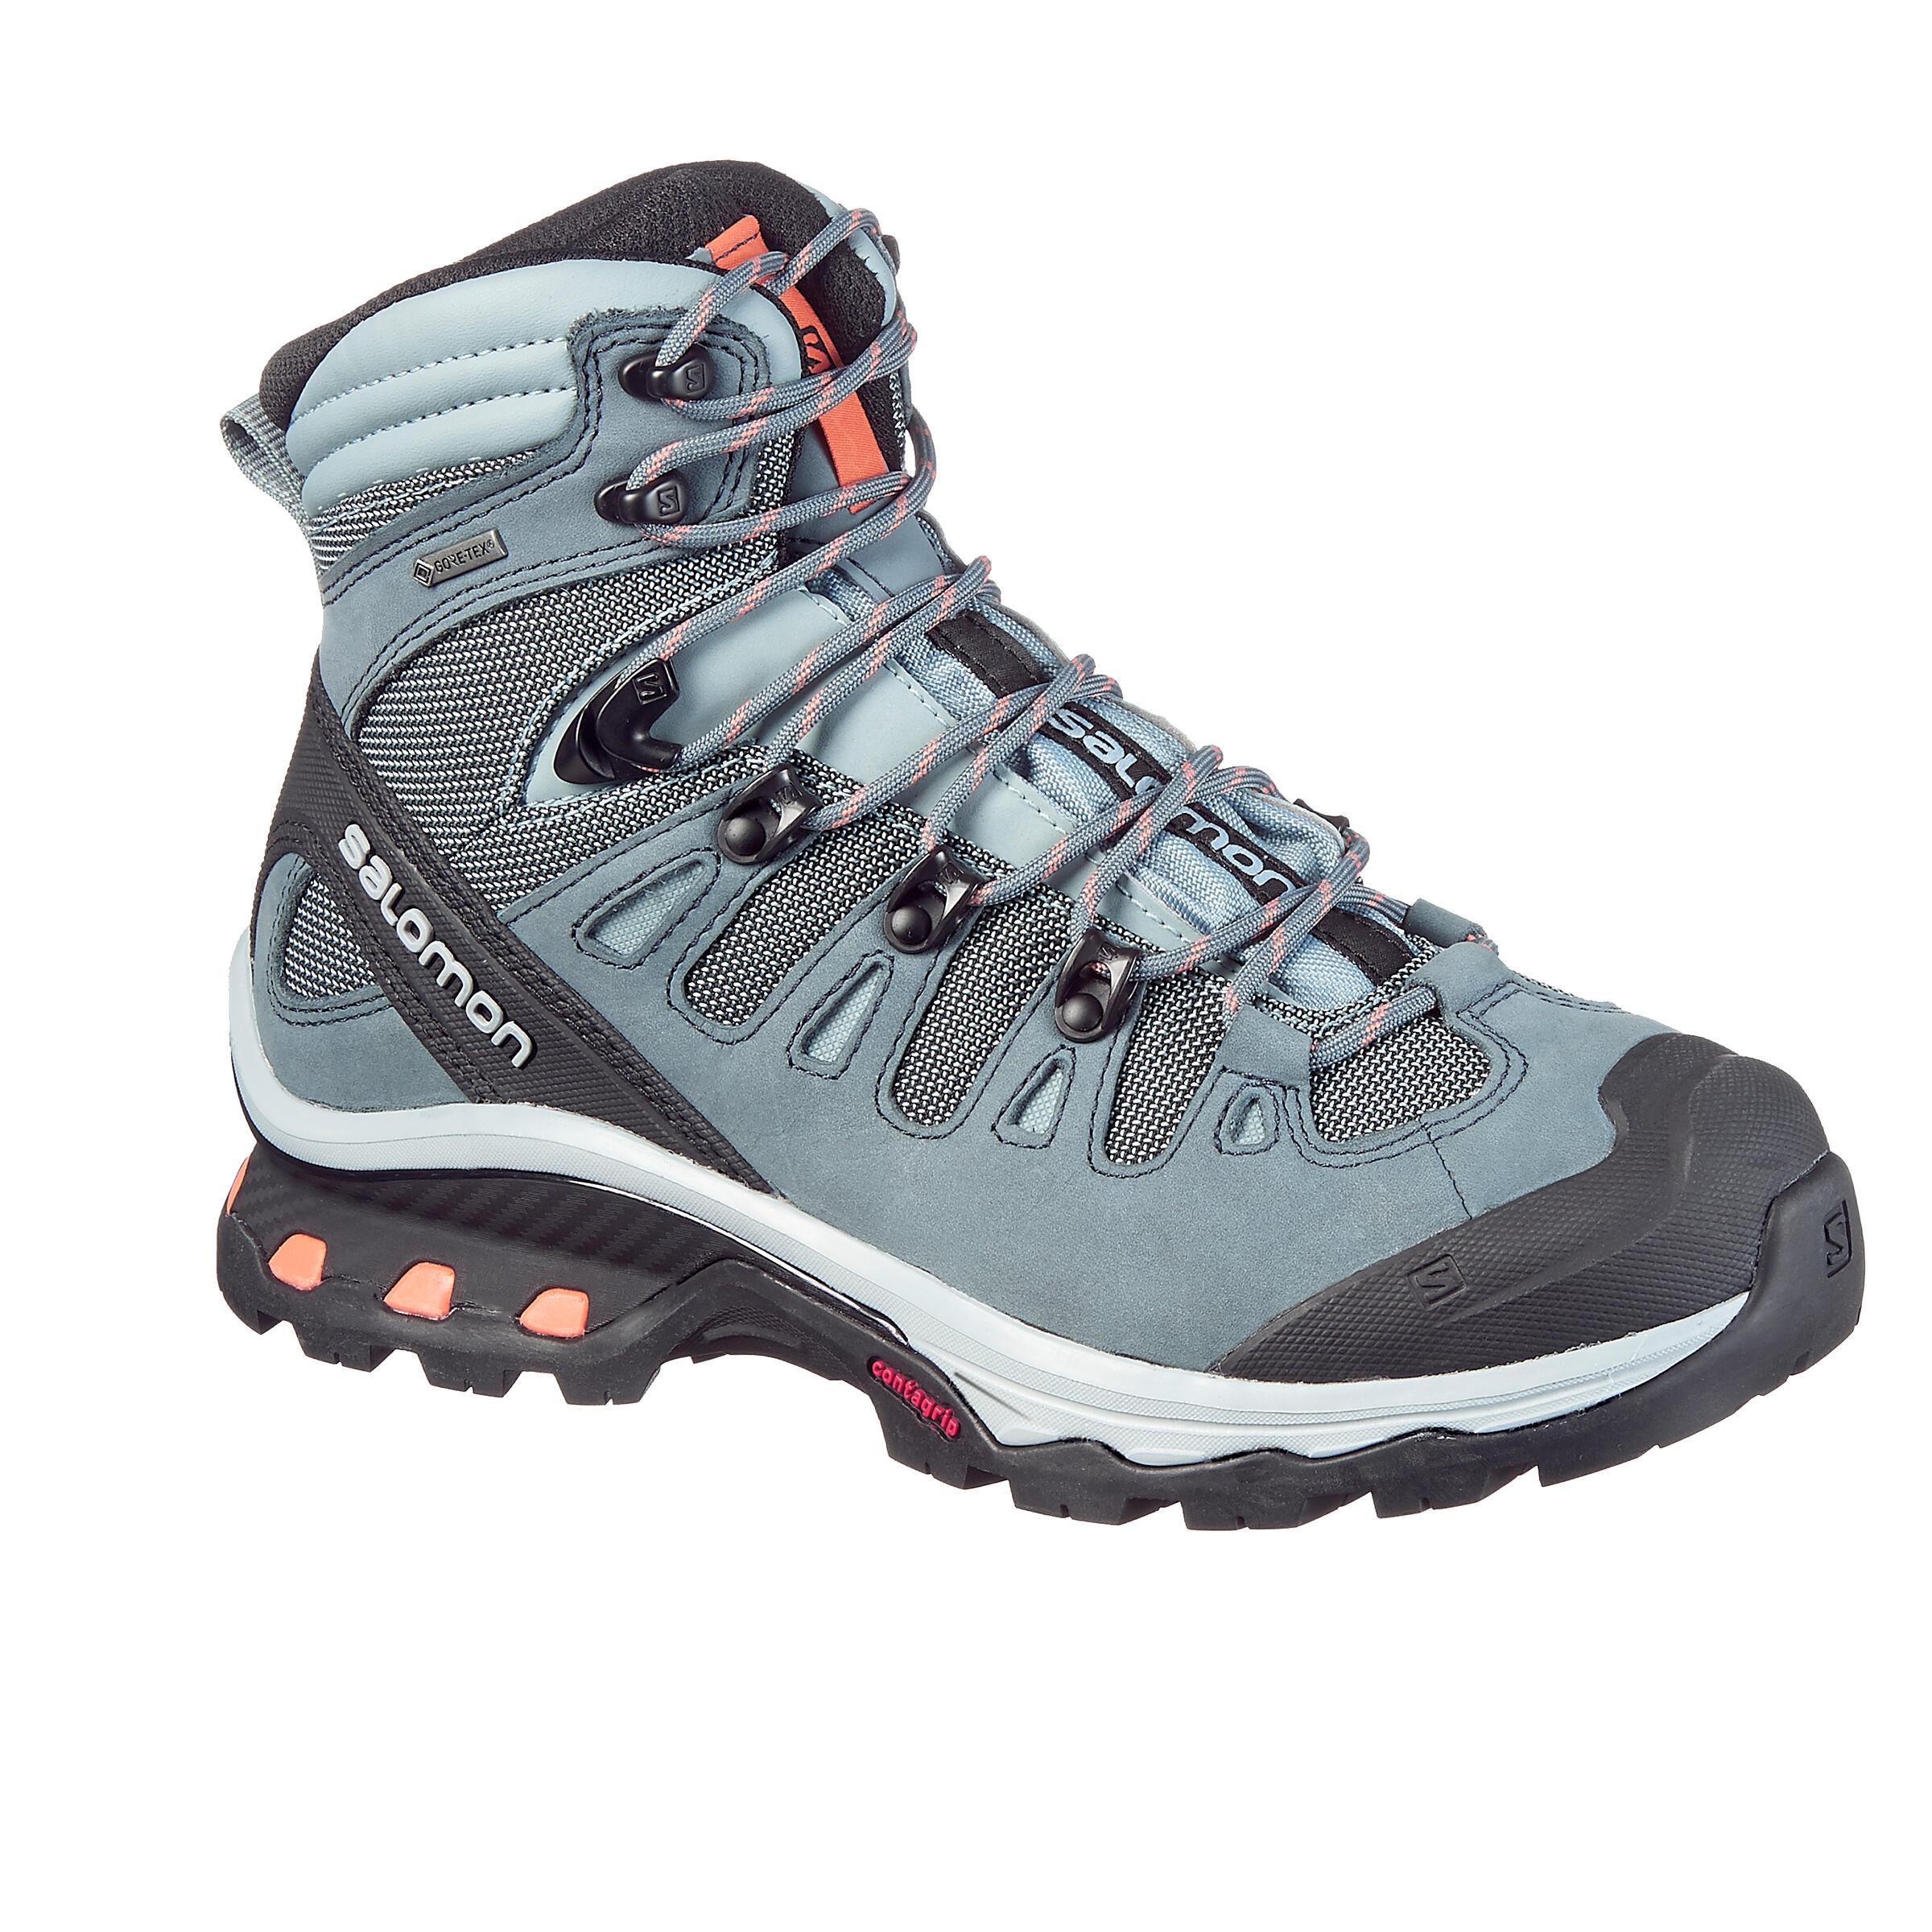 Trekkingschuhe Quest Damen blau | Schuhe > Outdoorschuhe > Trekkingschuhe | Salomon